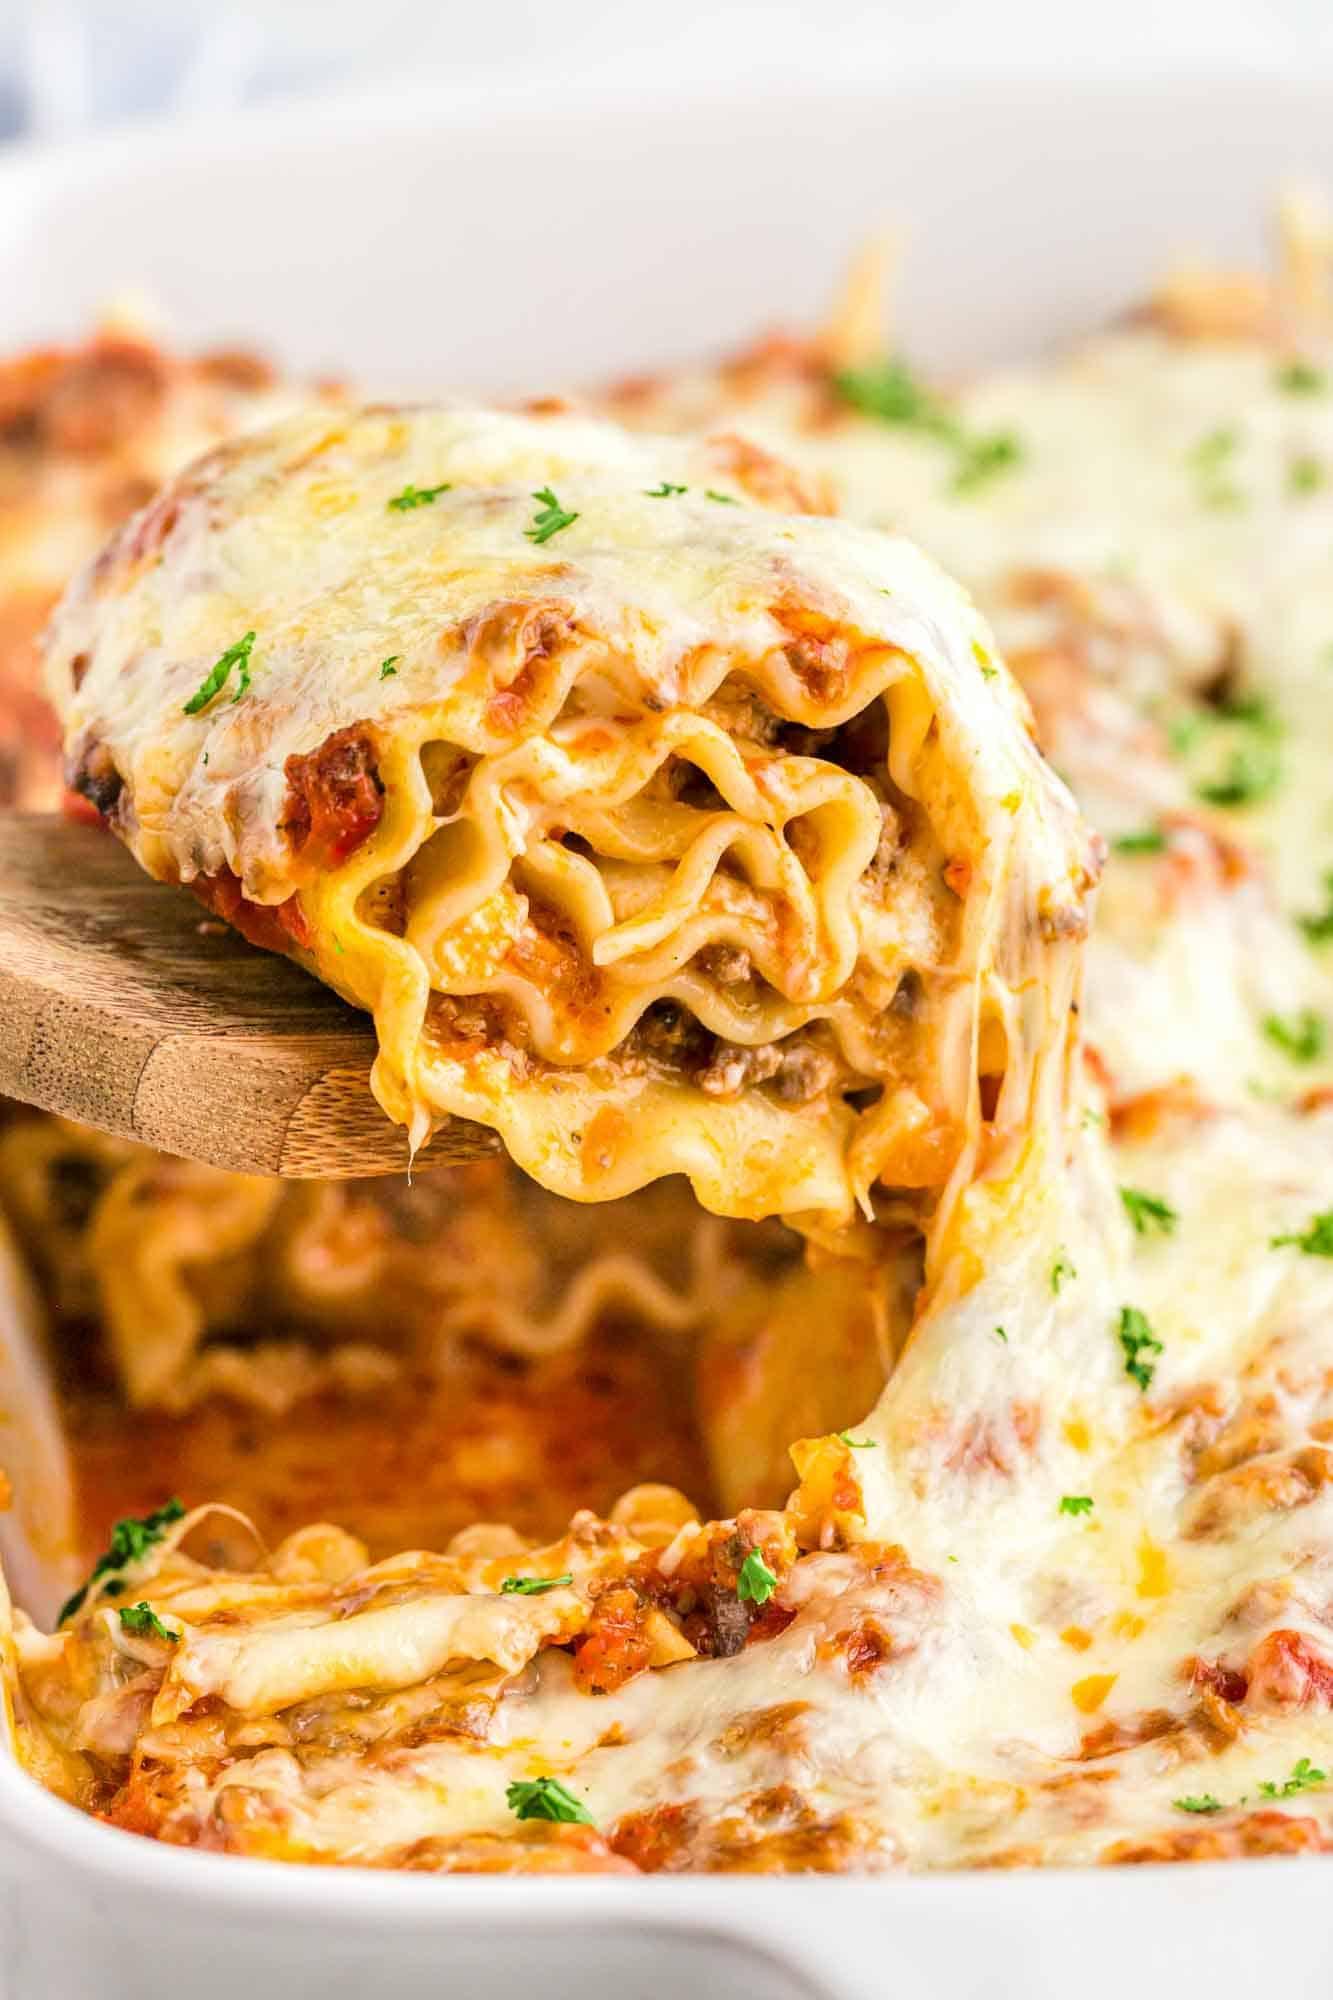 Warm and melty cheesy lasagna roll ups